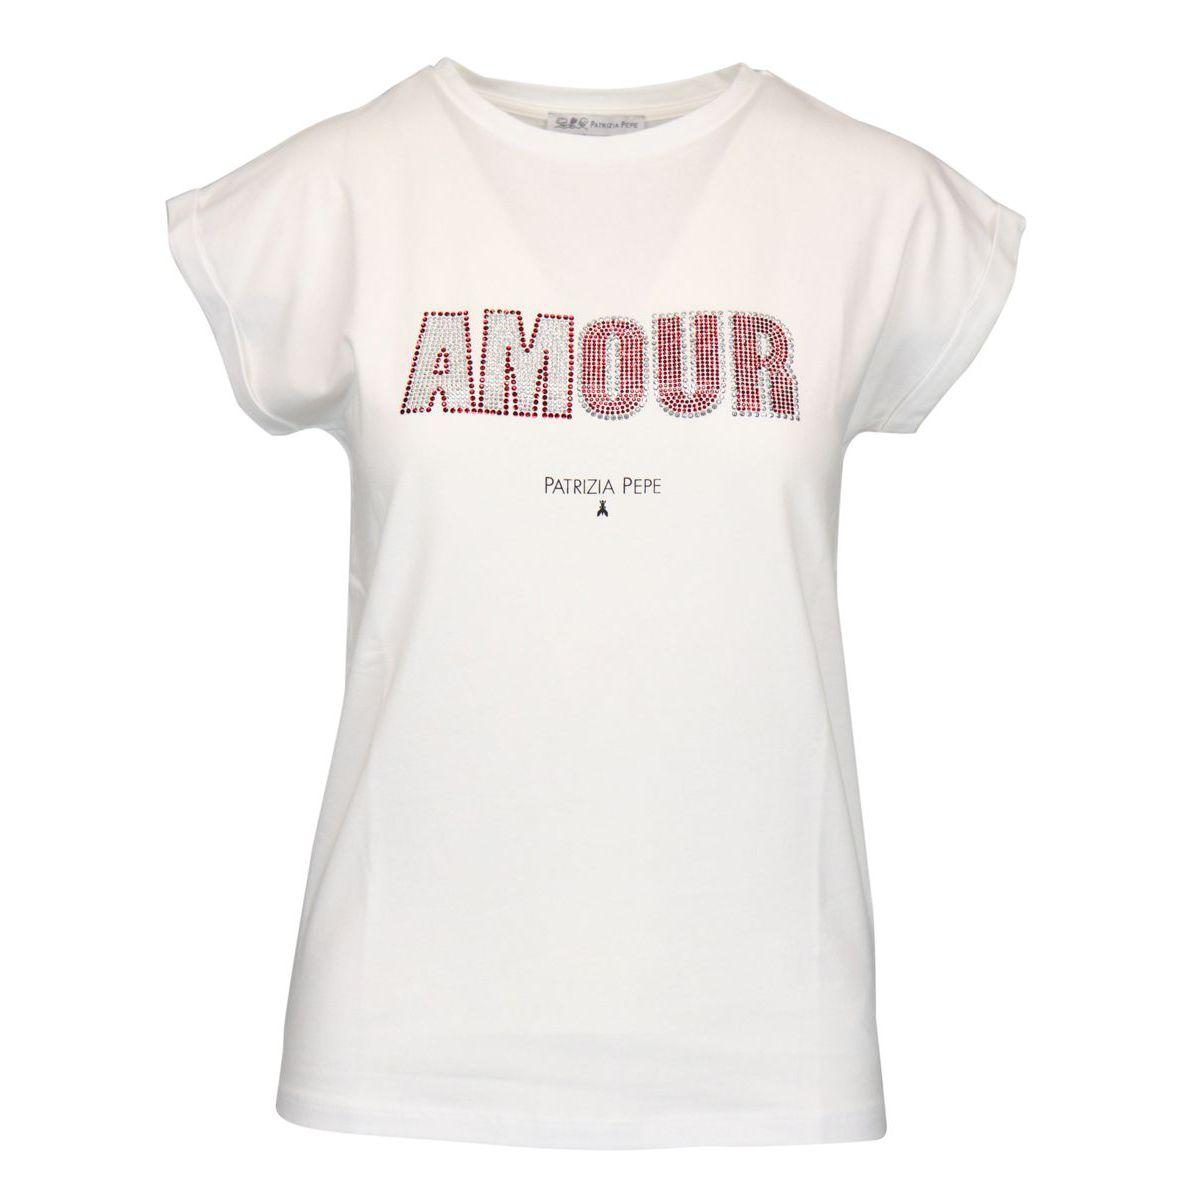 Cotton T-shirt with rhinestone writing White red Patrizia Pepe